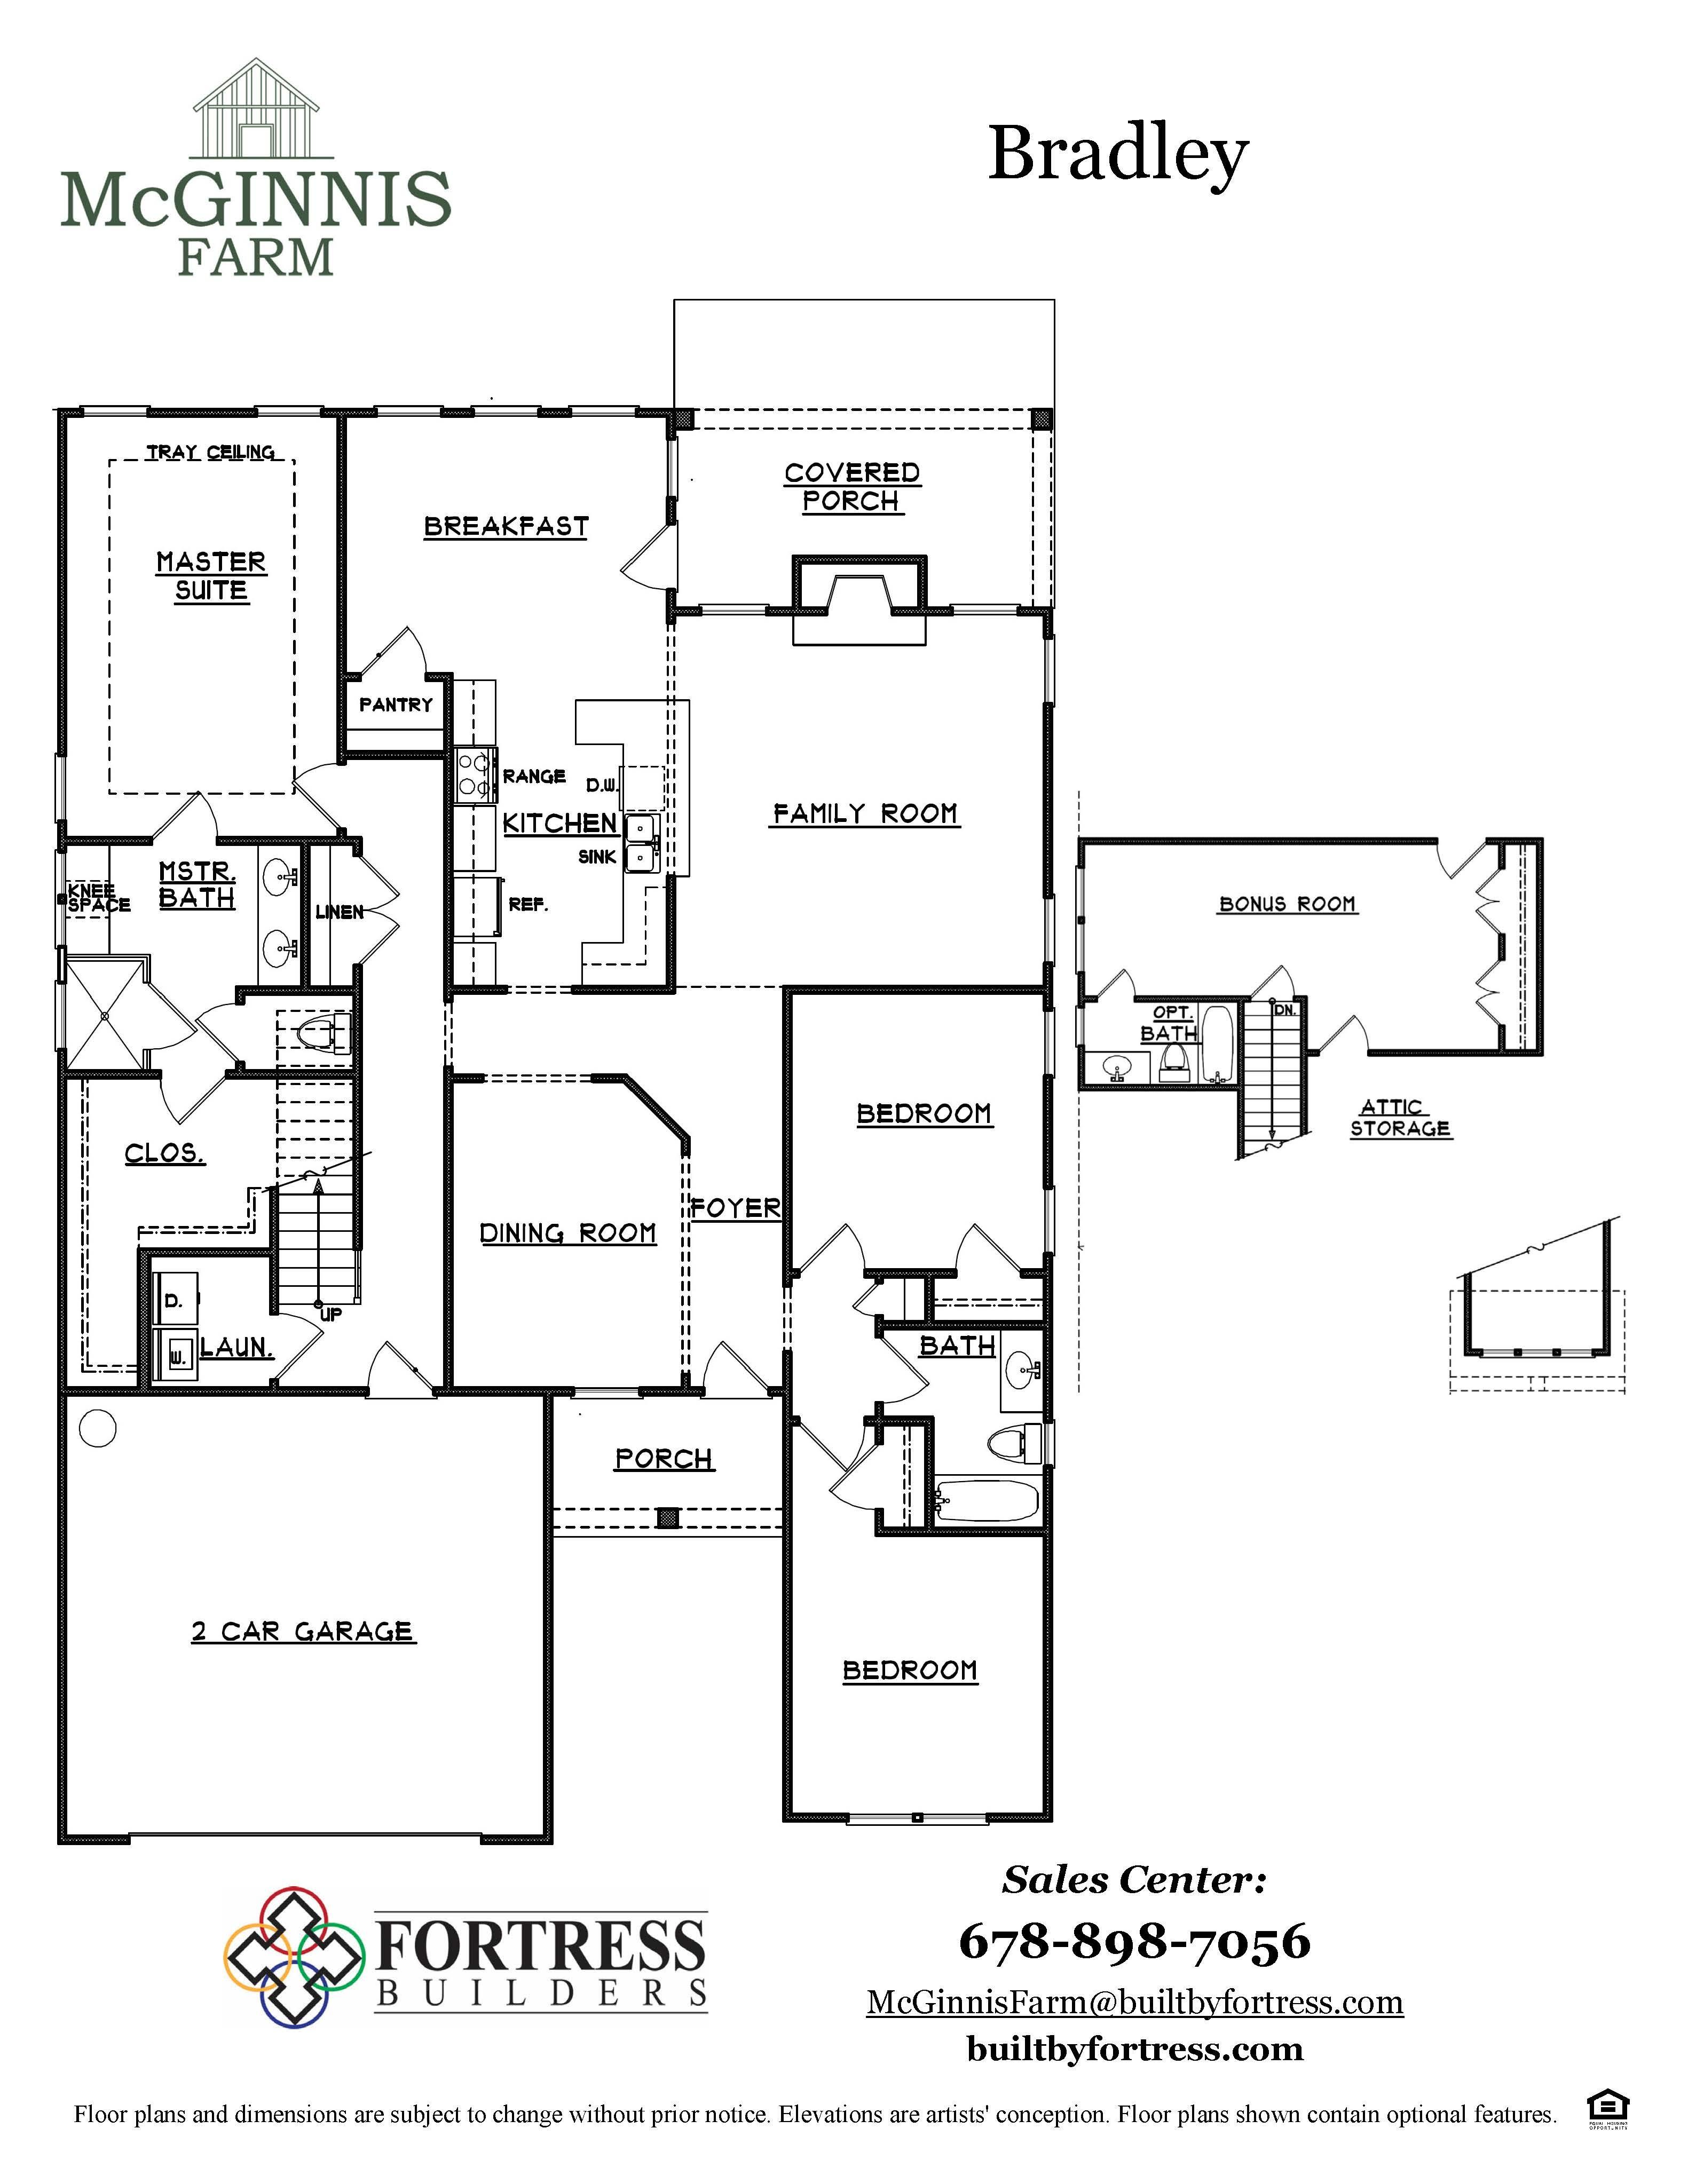 McGinnis Farm Floor Plans_Page_2.jpg